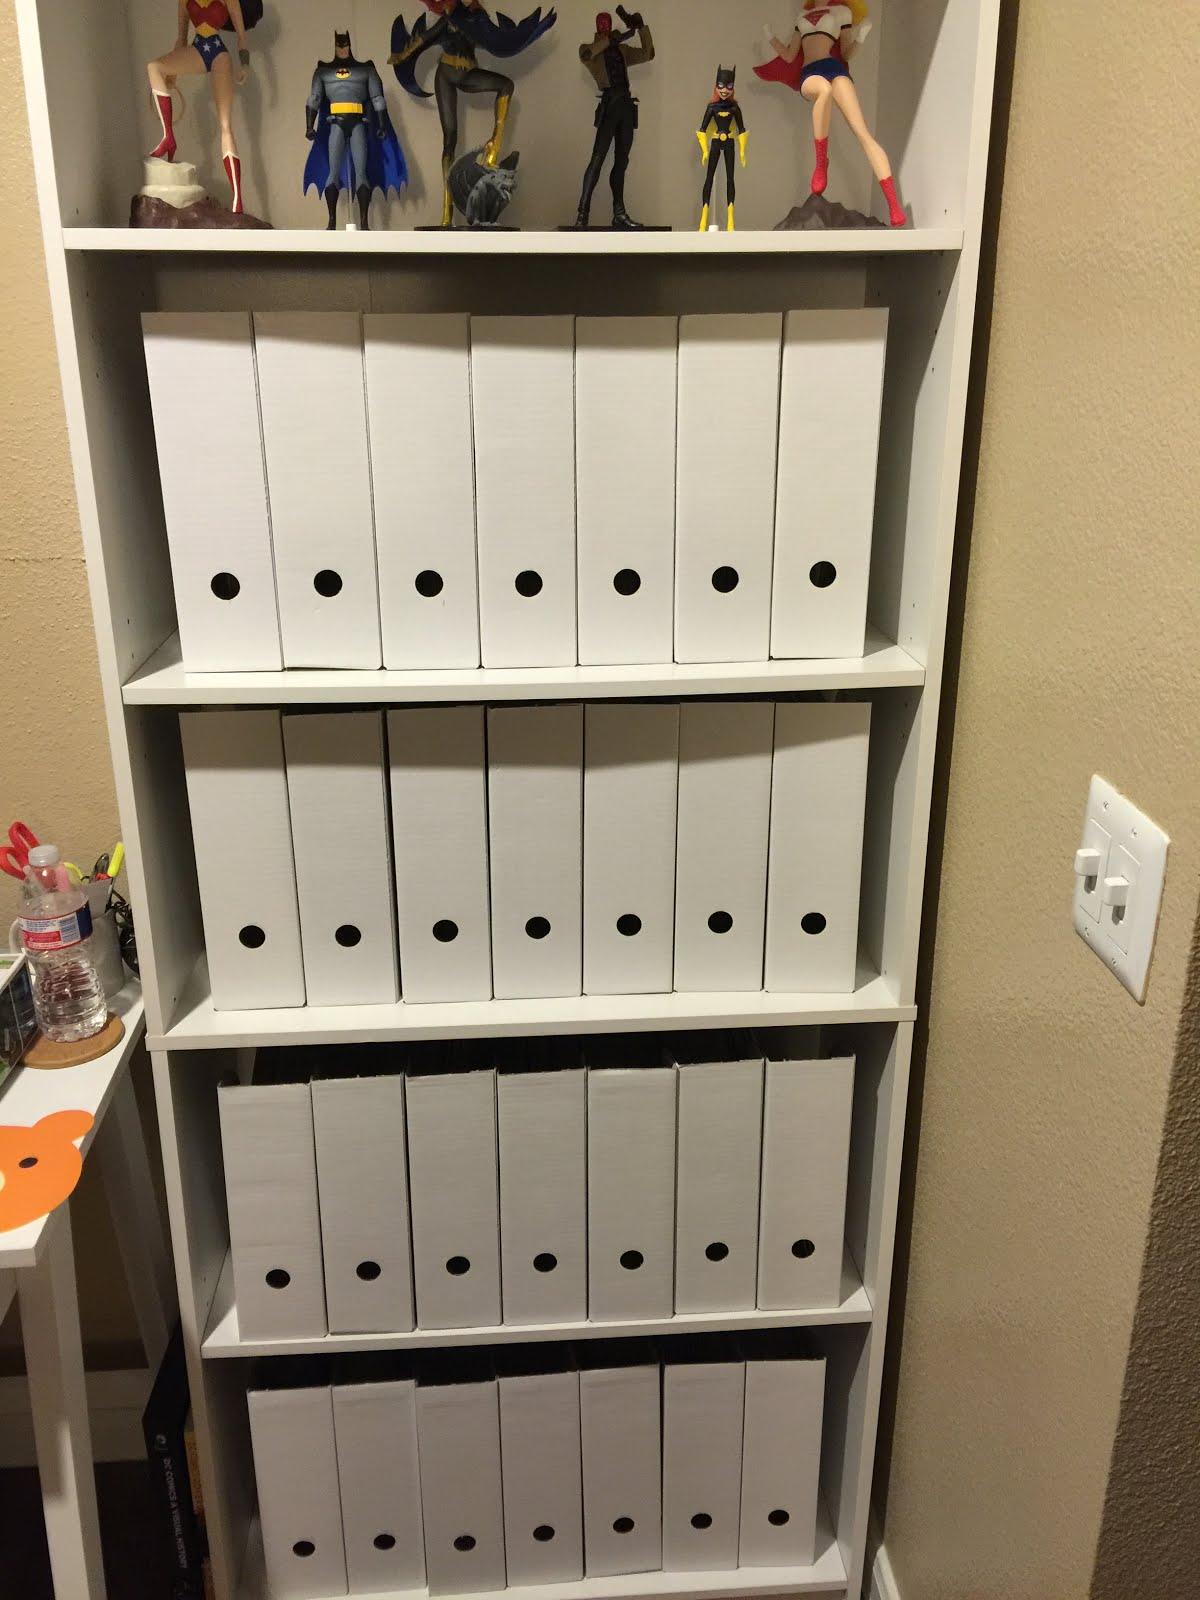 Easy Crafting with Kayla: Creative Comic Book Storage